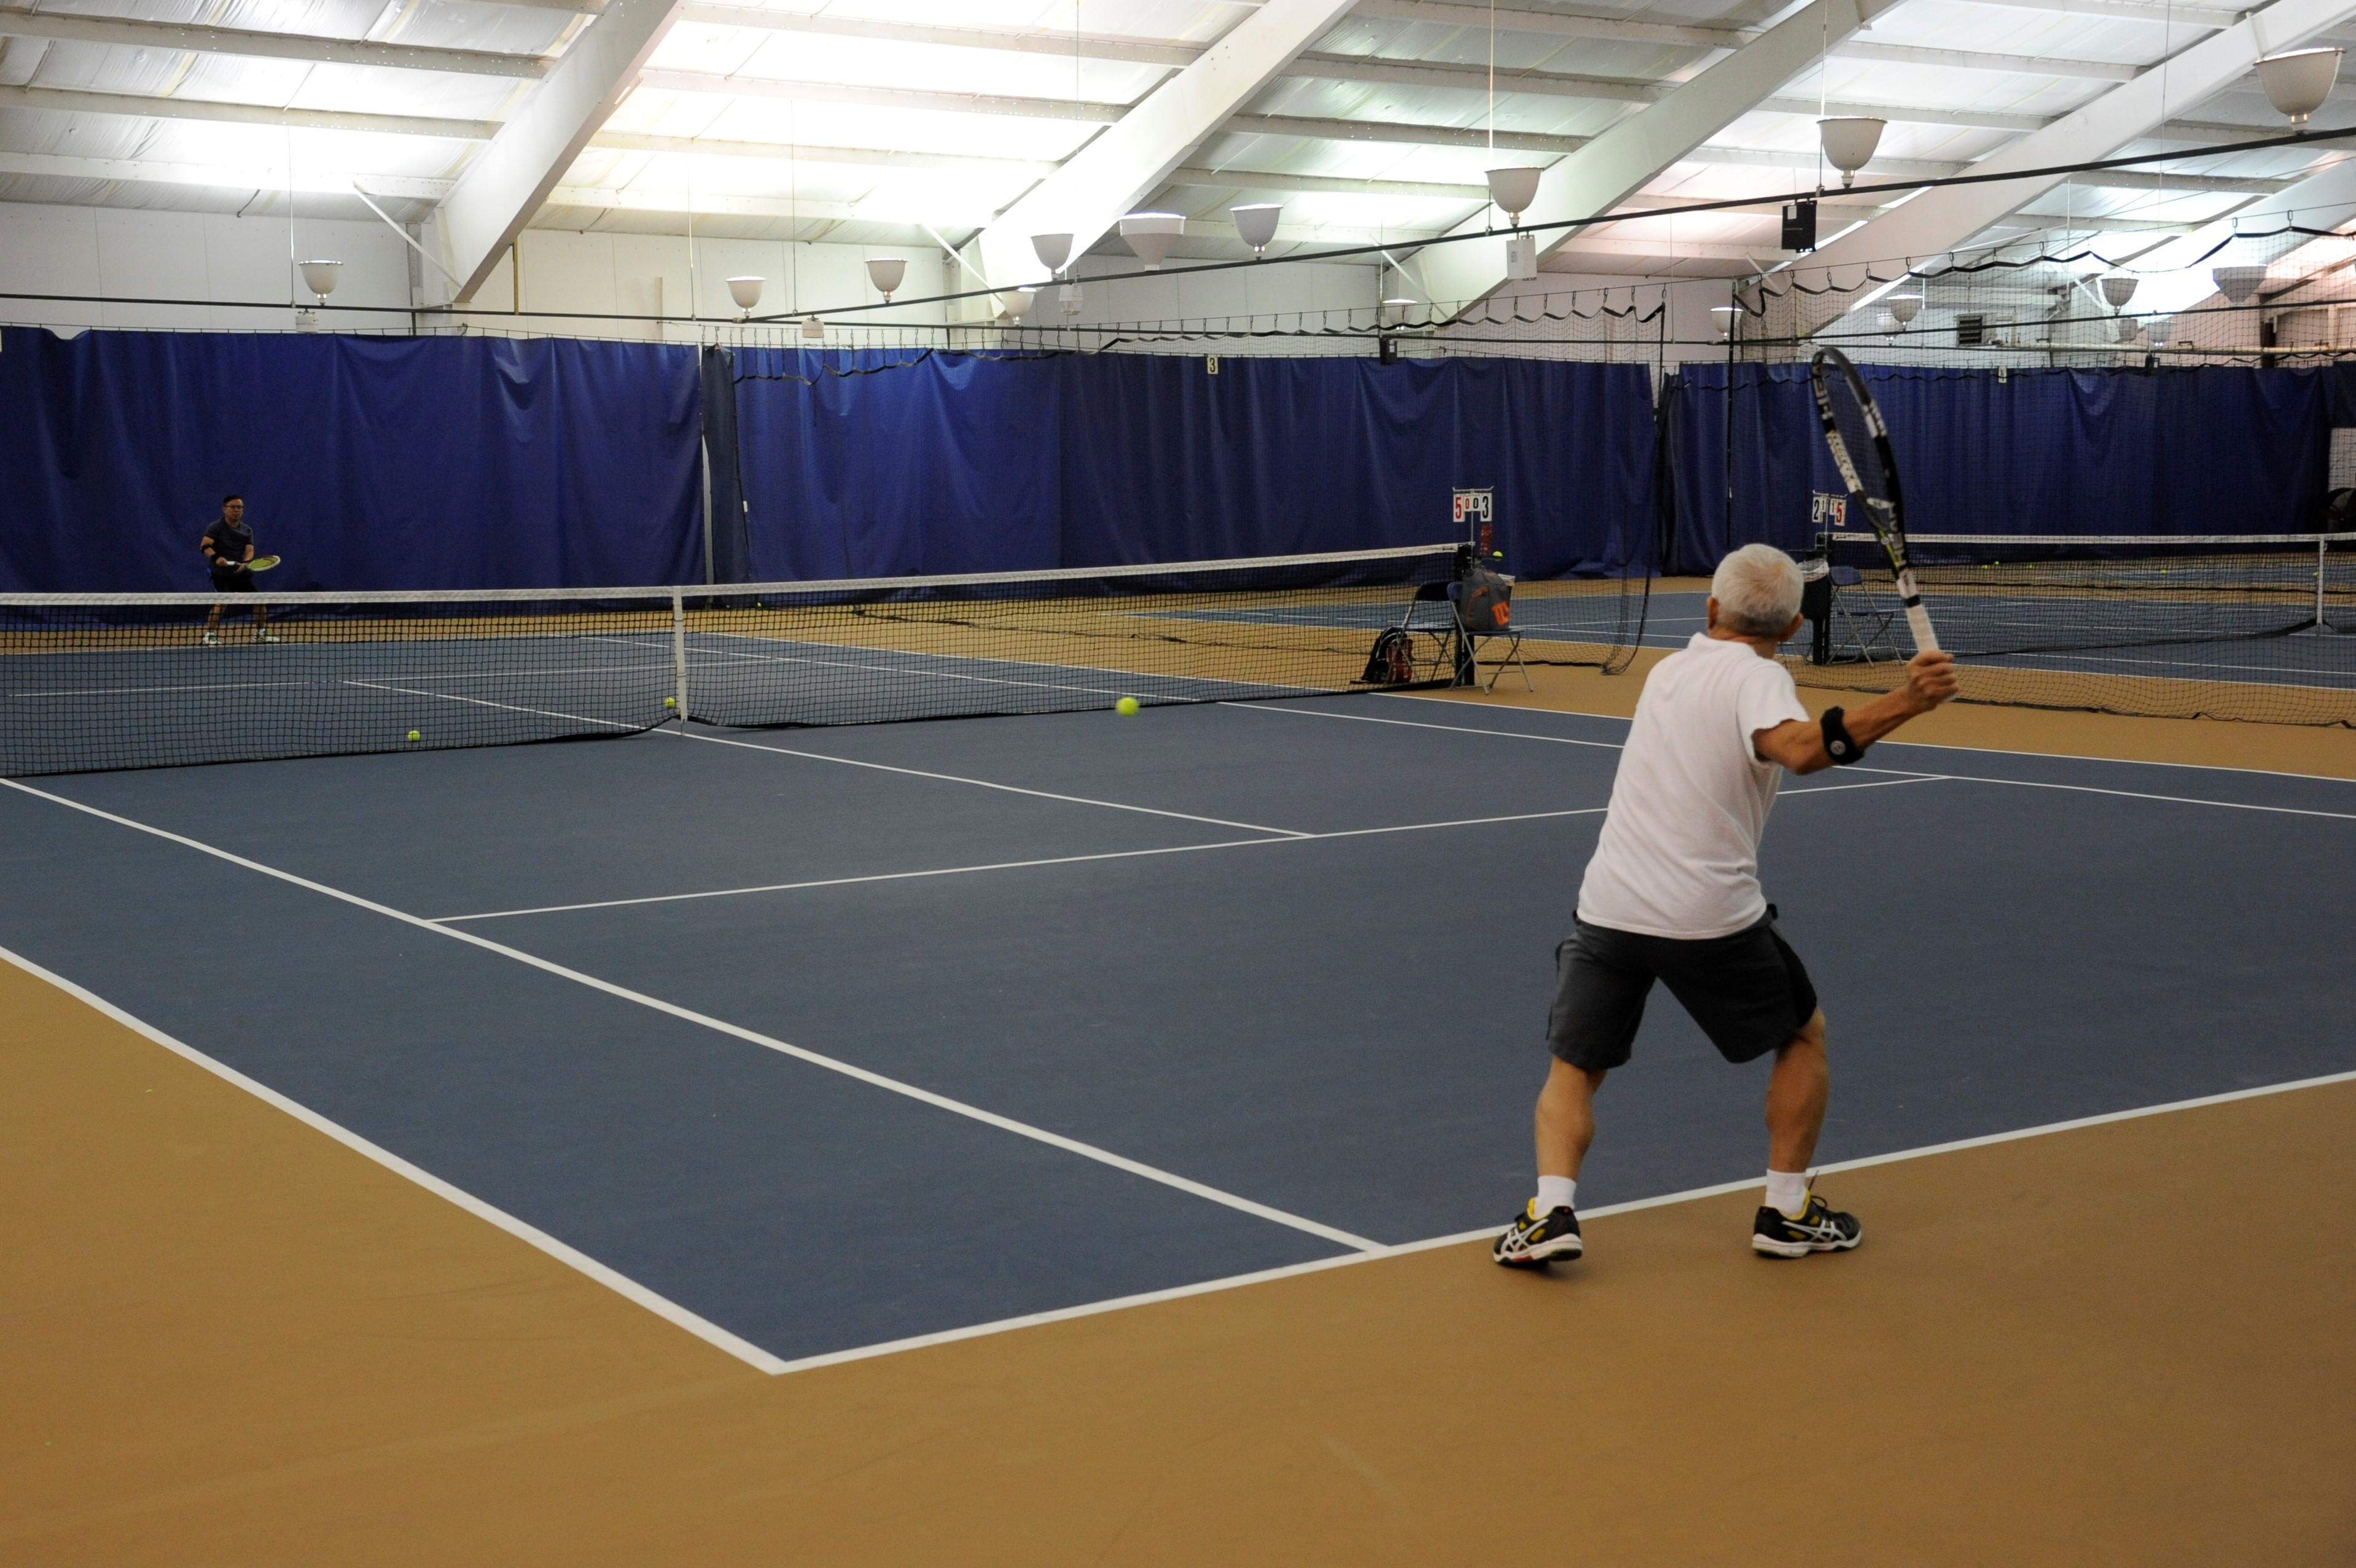 Wright-Patterson Tennis Club celebrates 40th anniversary